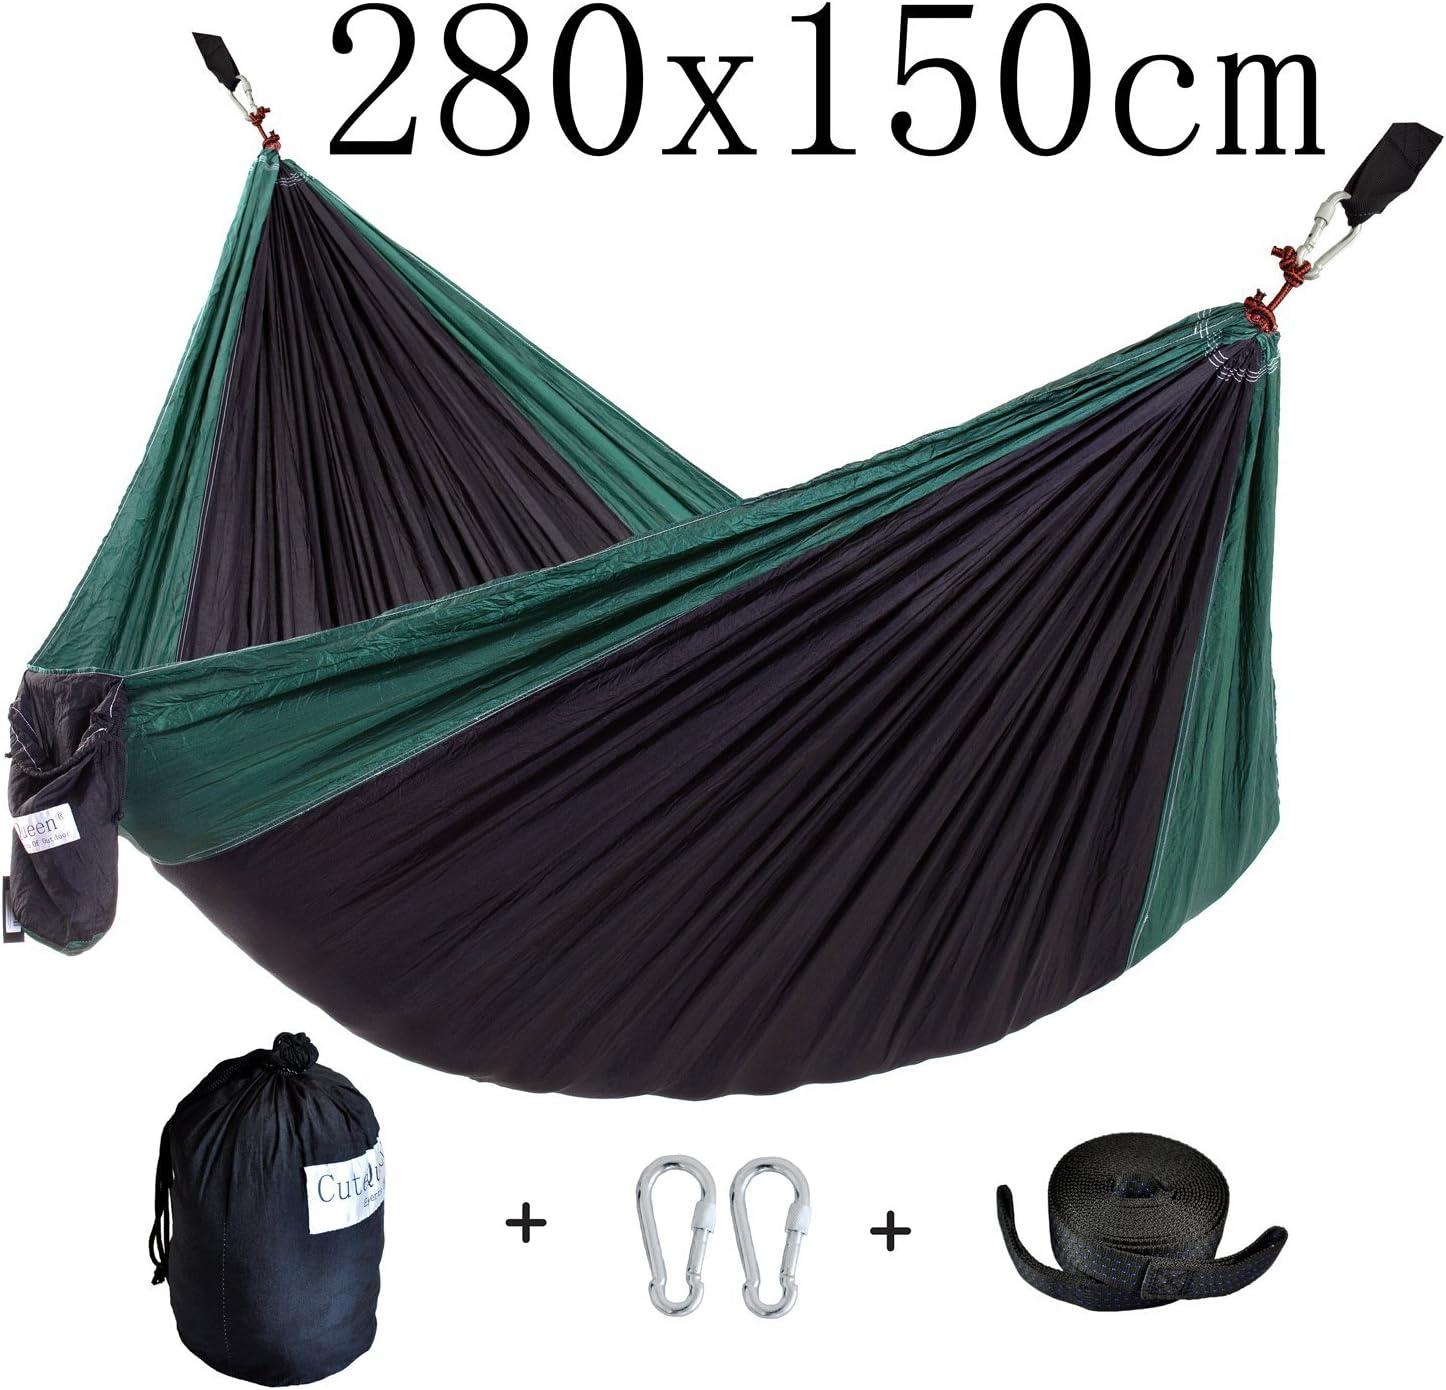 hammocks amazon    hammocks   hammocks stands  u0026 accessories  patio lawn      rh   amazon